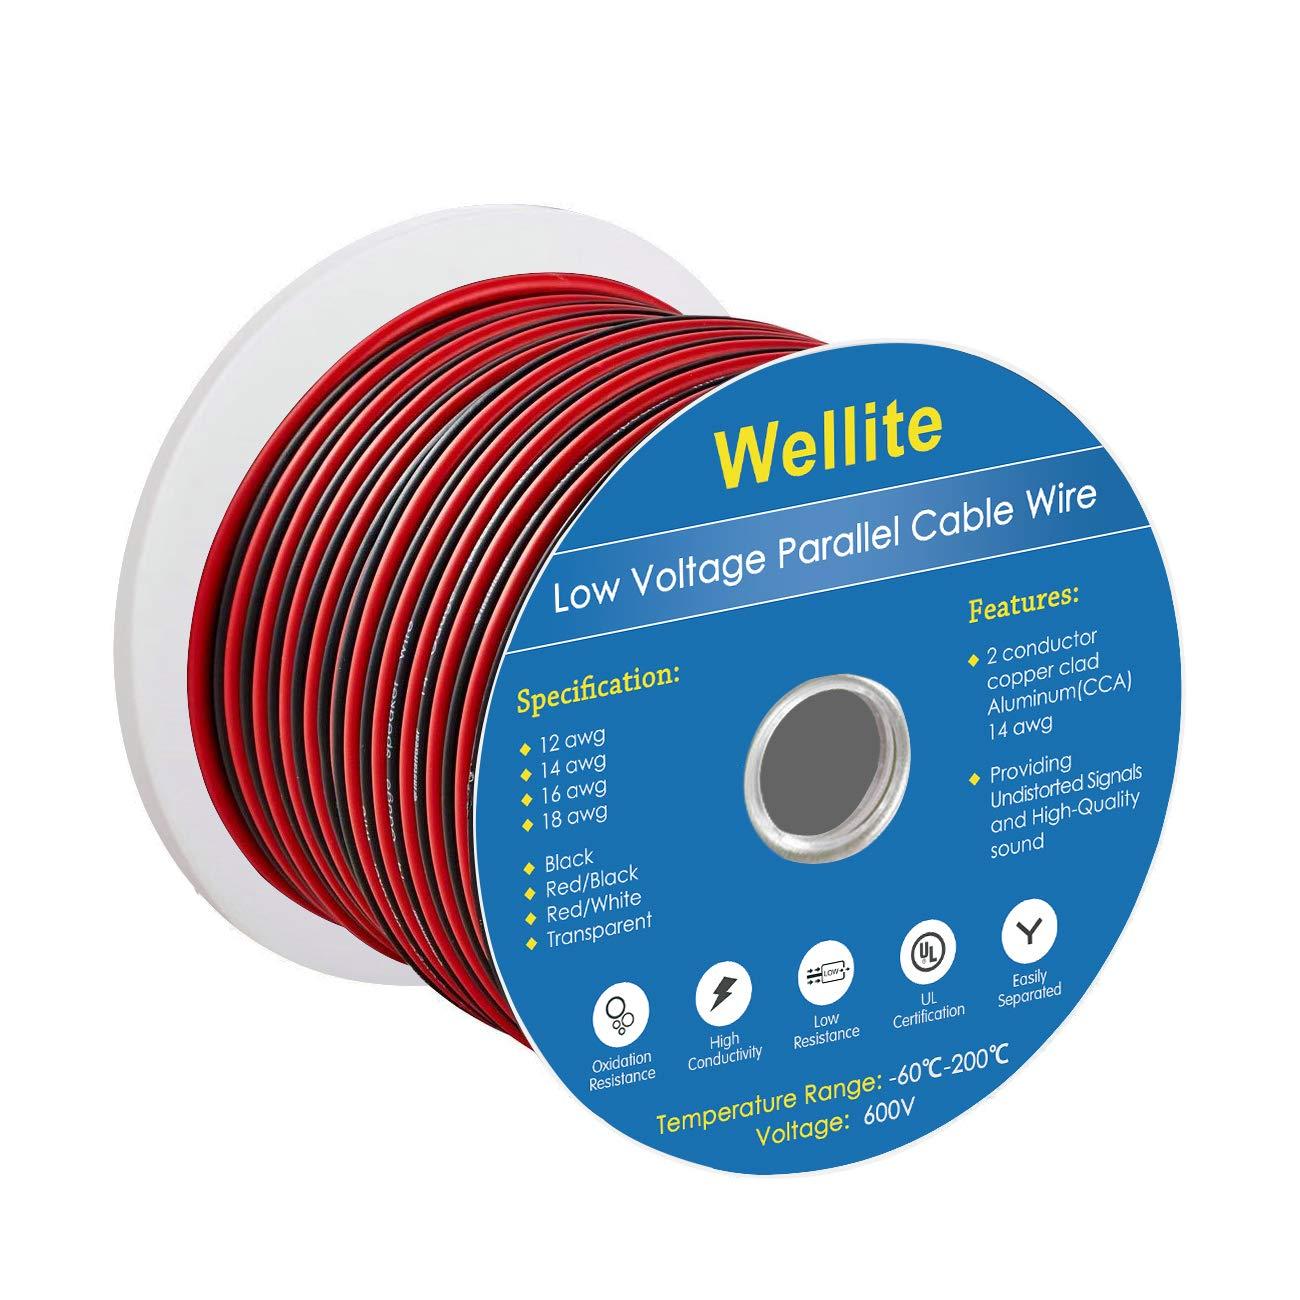 Wellite 66 ft 12 – 2 AWGゲージ電気ワイヤ、低電圧for Landscape照明システム、レッド&ブラック平行ワイヤ   B07CRY3TLC